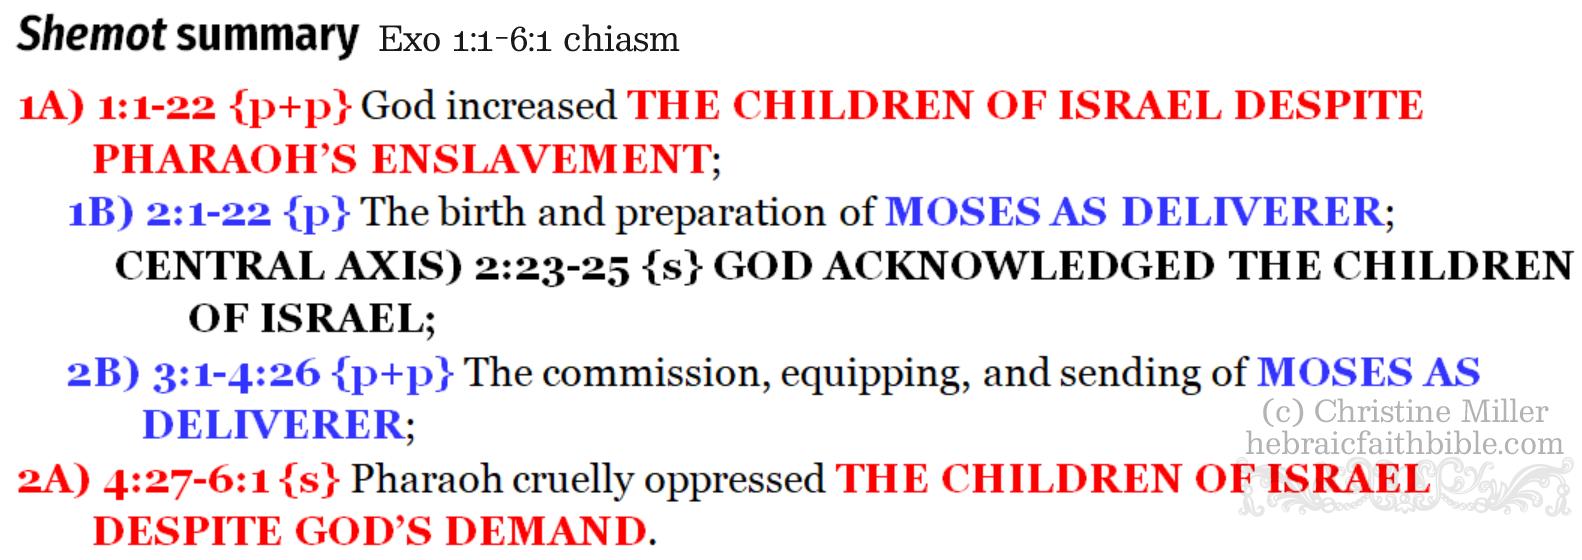 Exo 1:1-6:1 chiasm, shemot summary | hebraicfaithbible.com